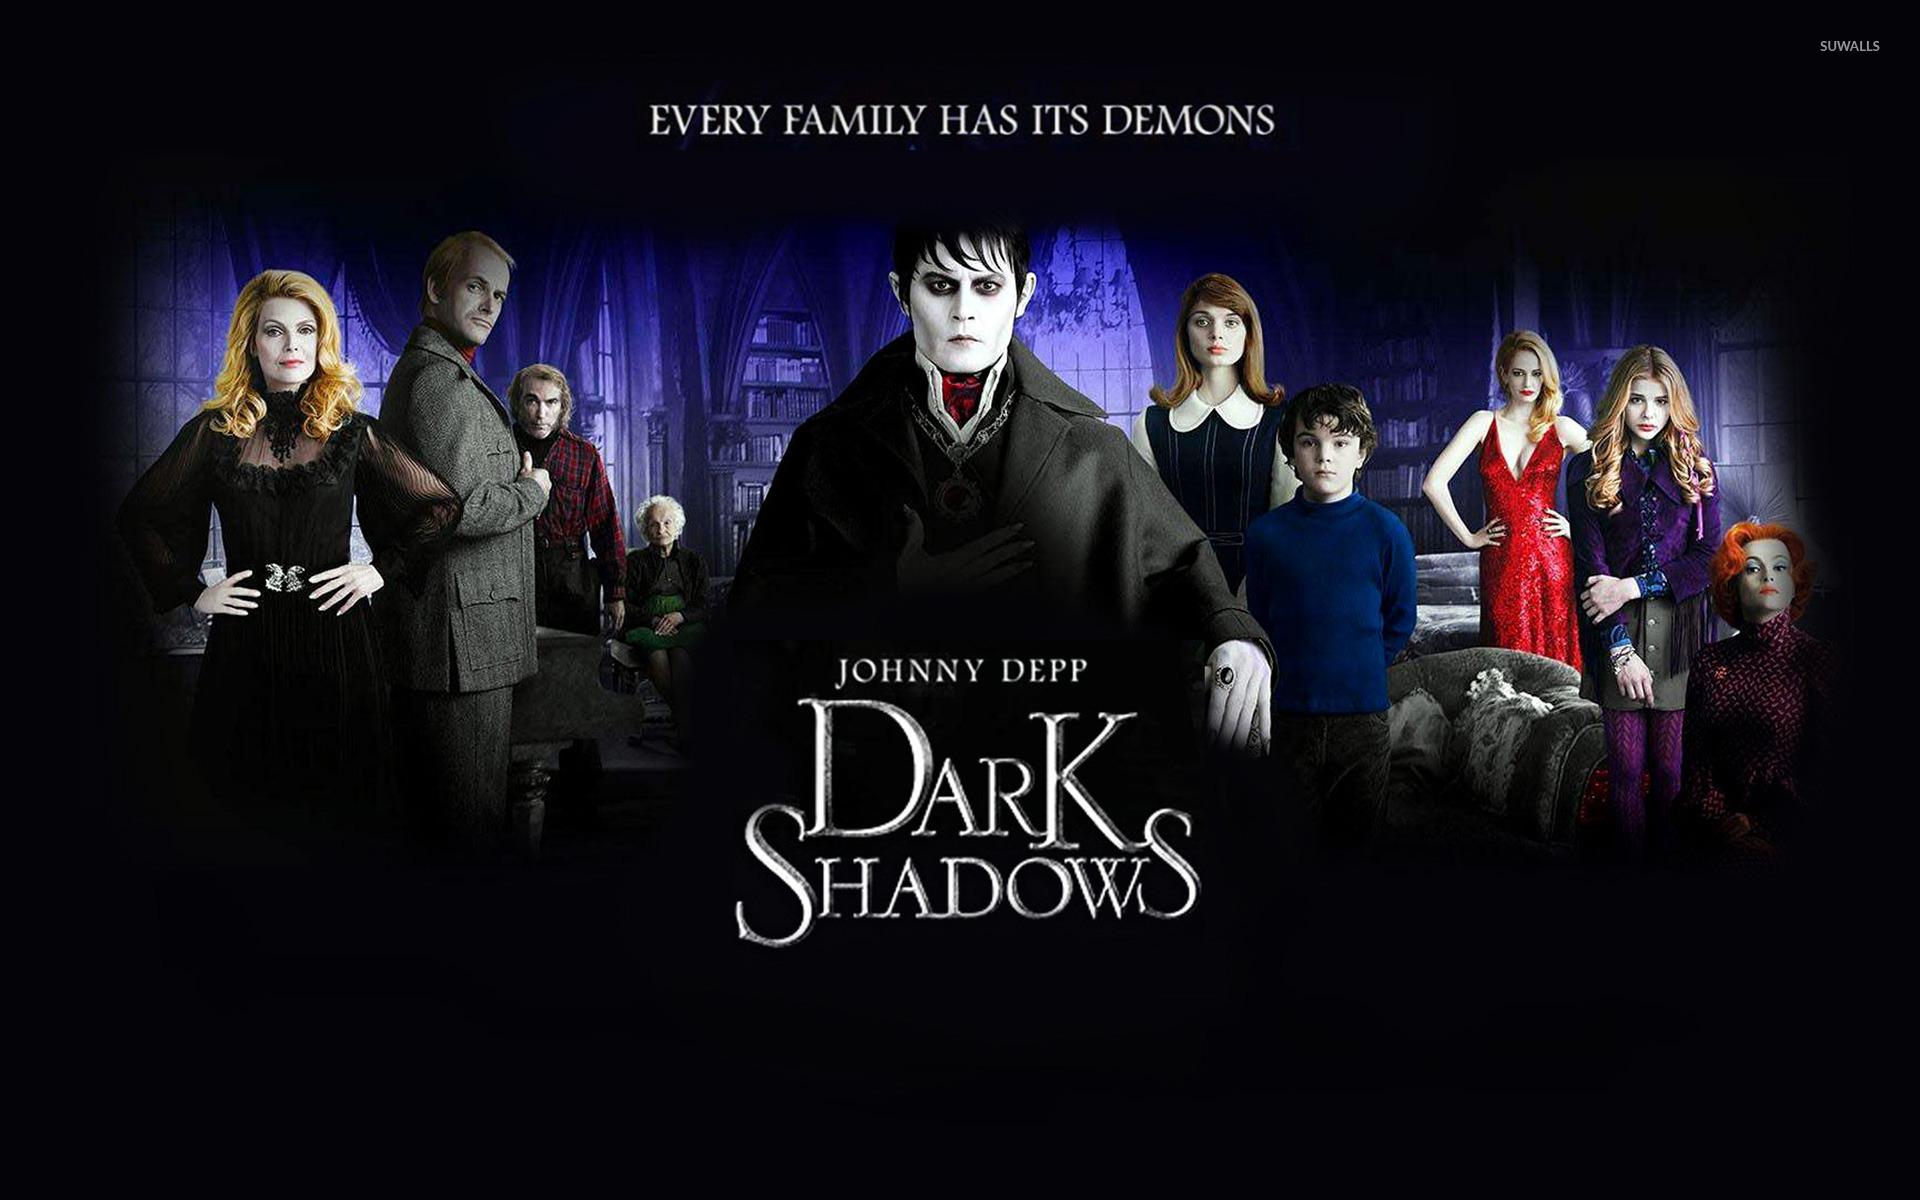 Dark Shadows wallpaper   Movie wallpapers   12934 1920x1200